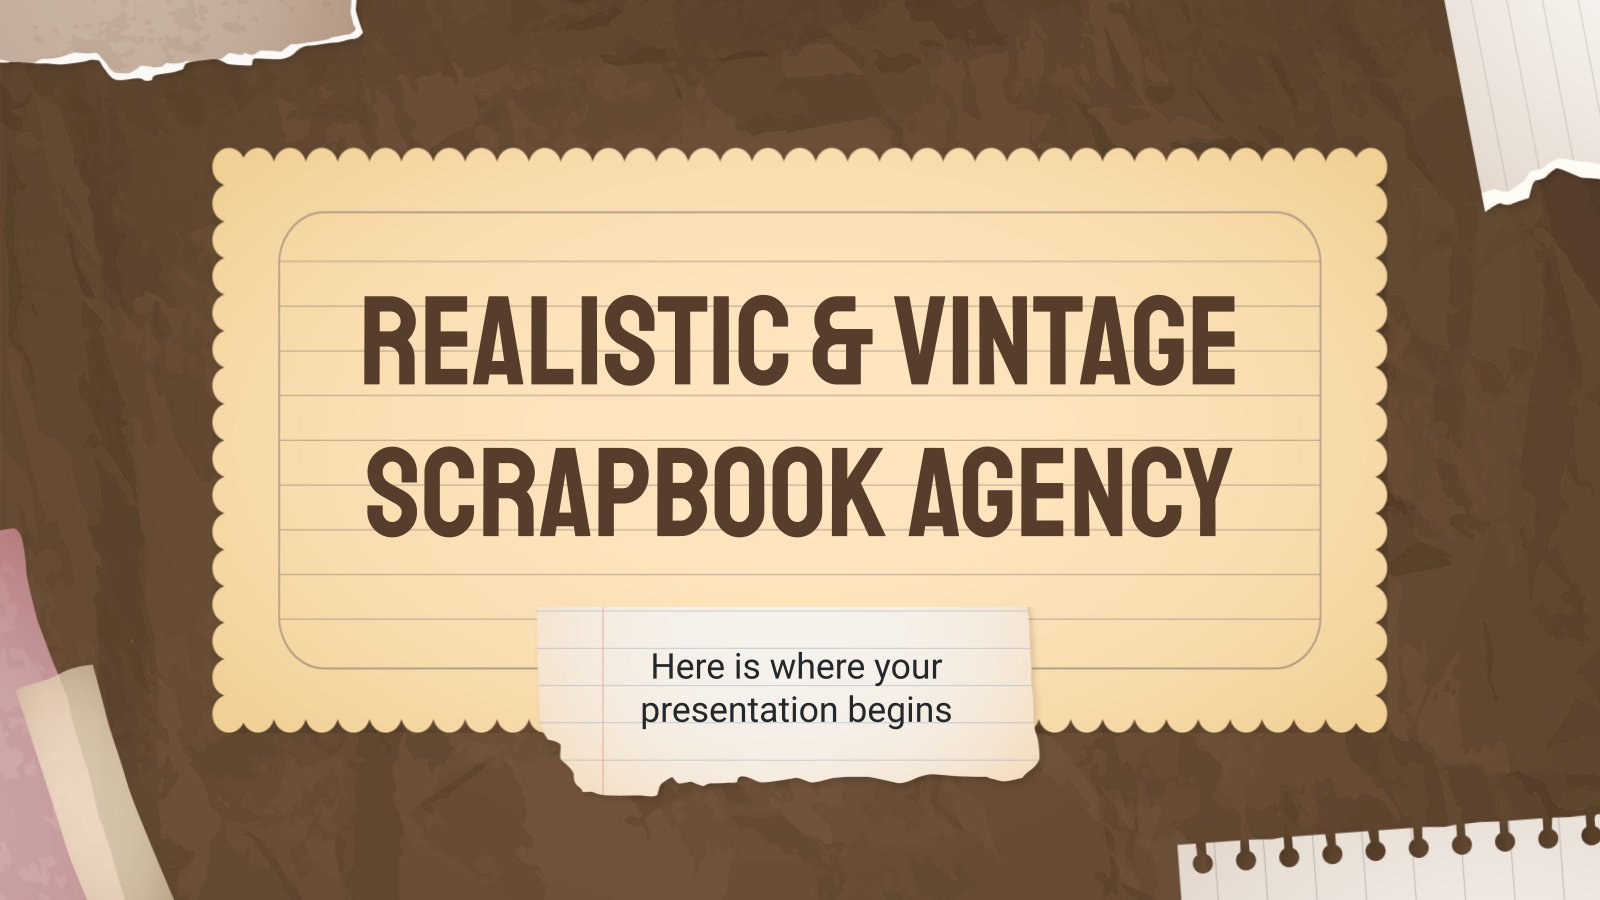 Realistic & Vintage Scrapbook Agency presentation template